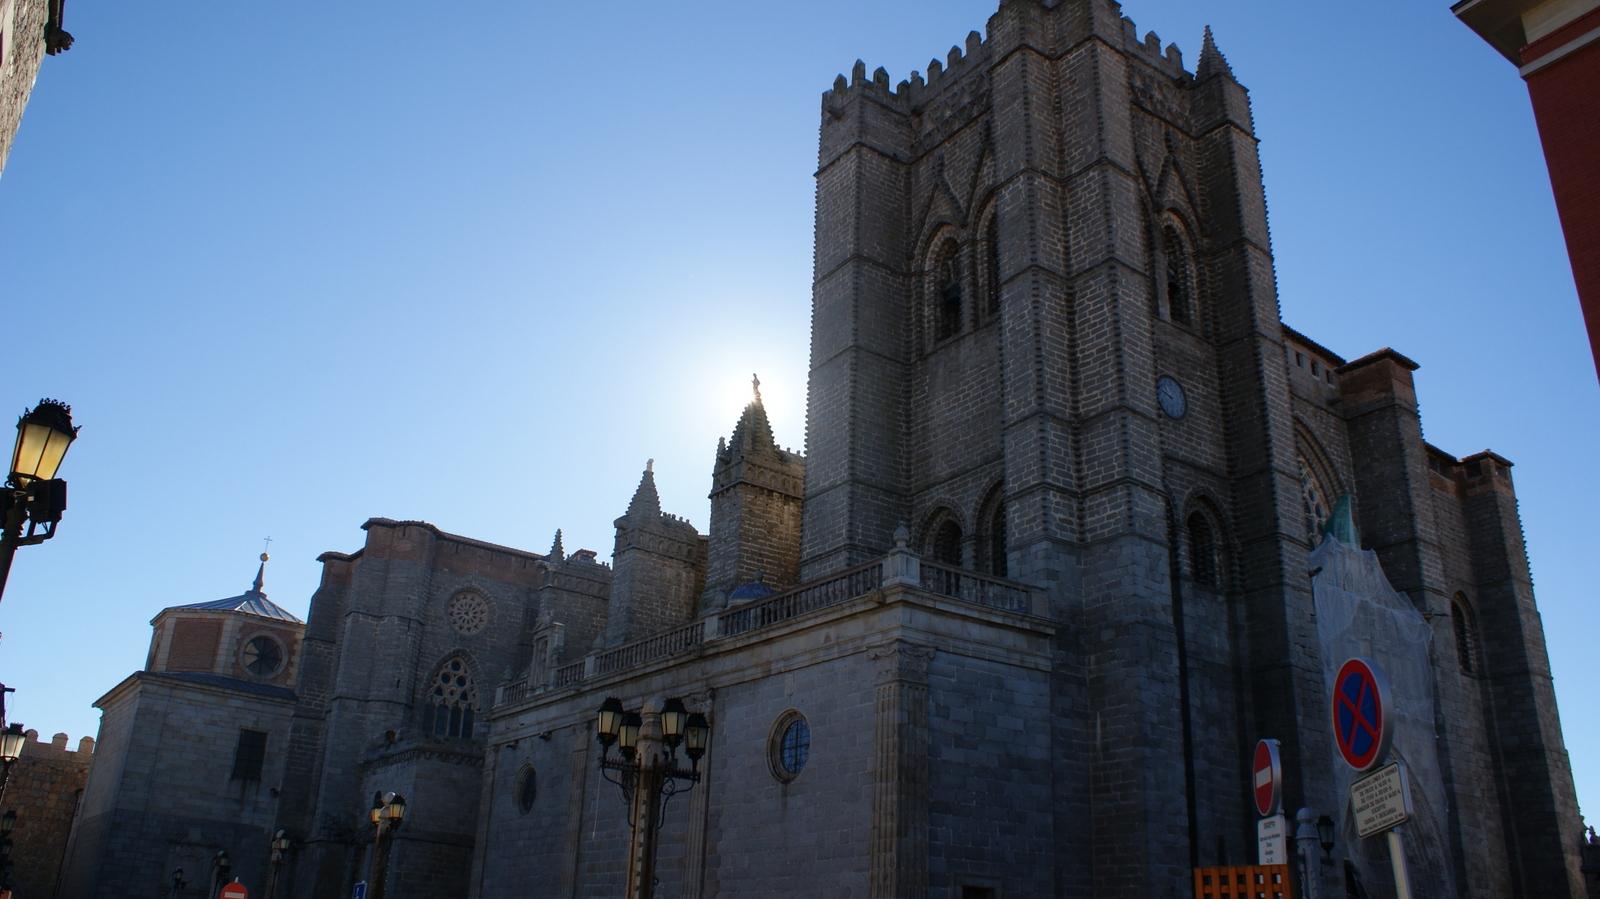 File:Catedral del Salvador de Ávila 15.JPG - Wikimedia Commons